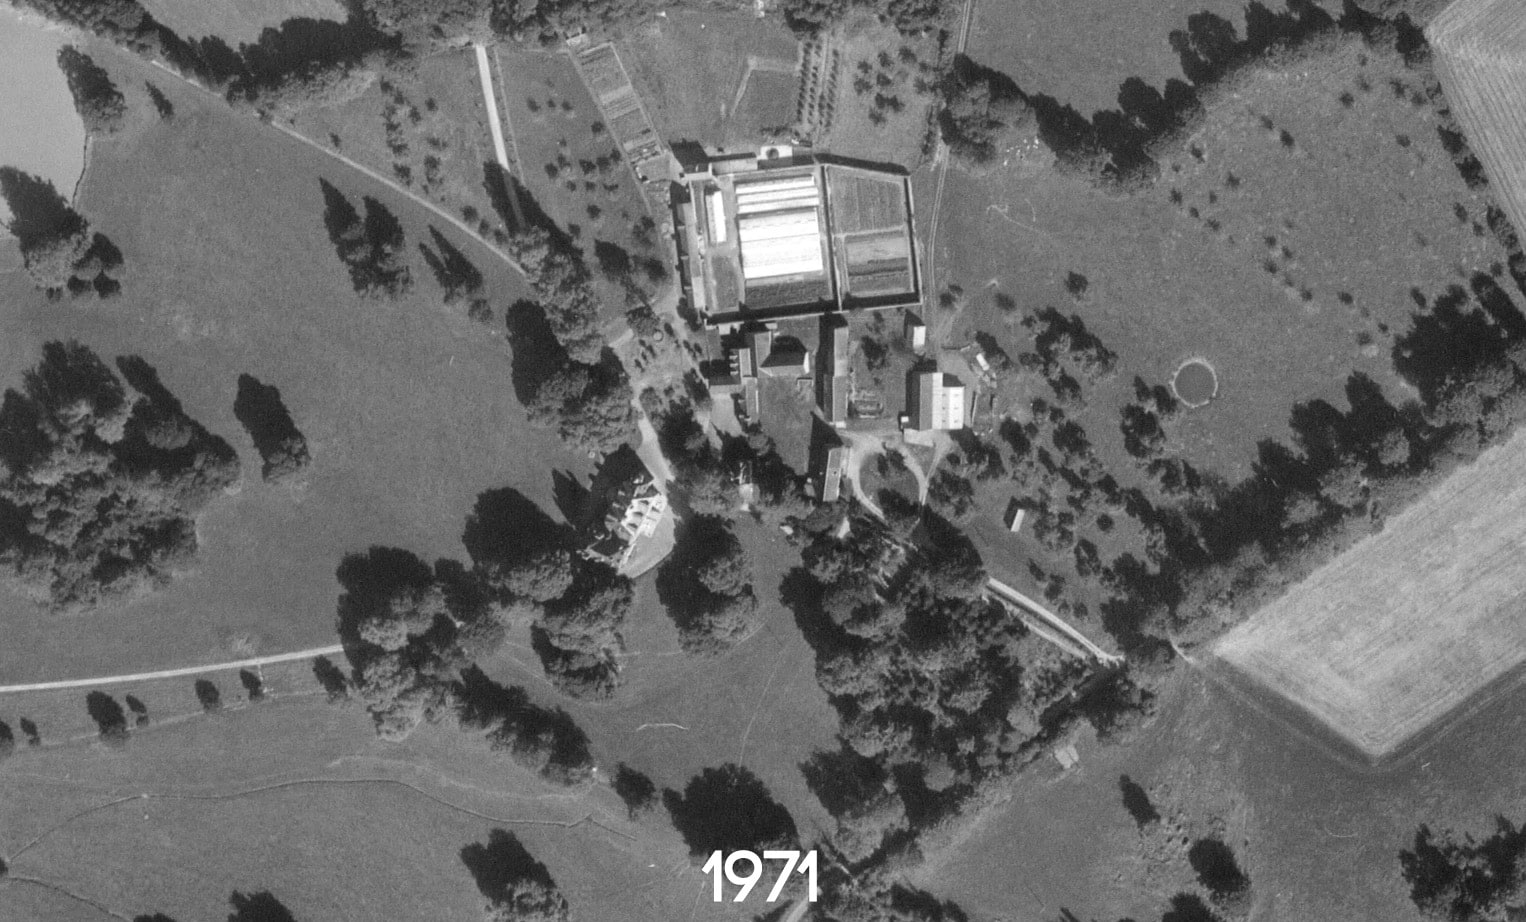 Château abandonné en France | urbexsession.com/chateau-marko-bey | Urbex France